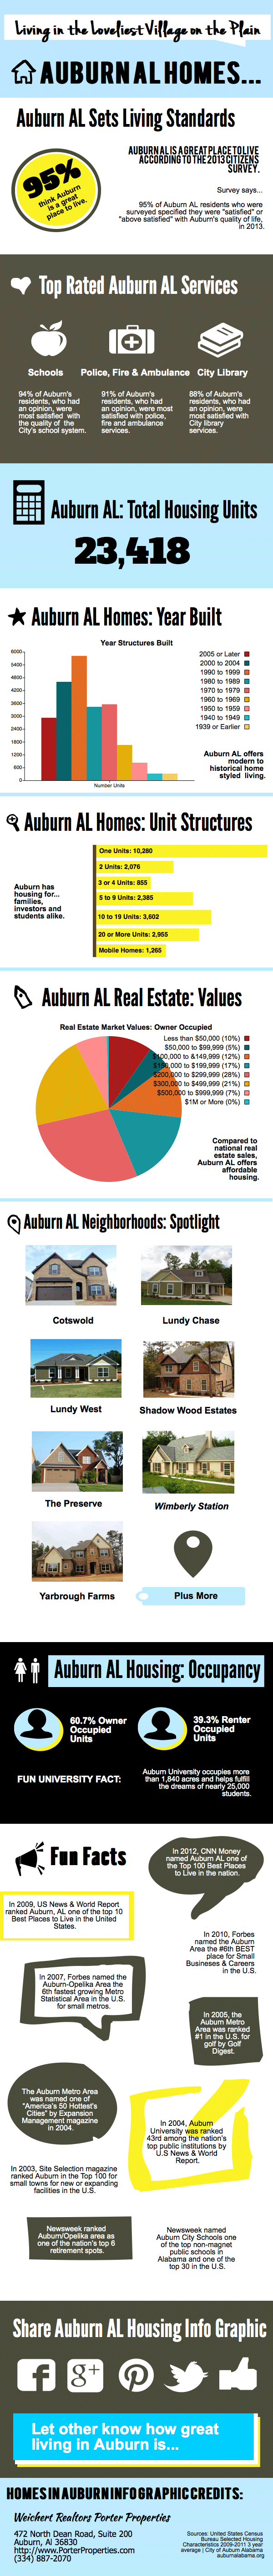 Auburn AL Home: Living on the Loveliest Village on the Plain